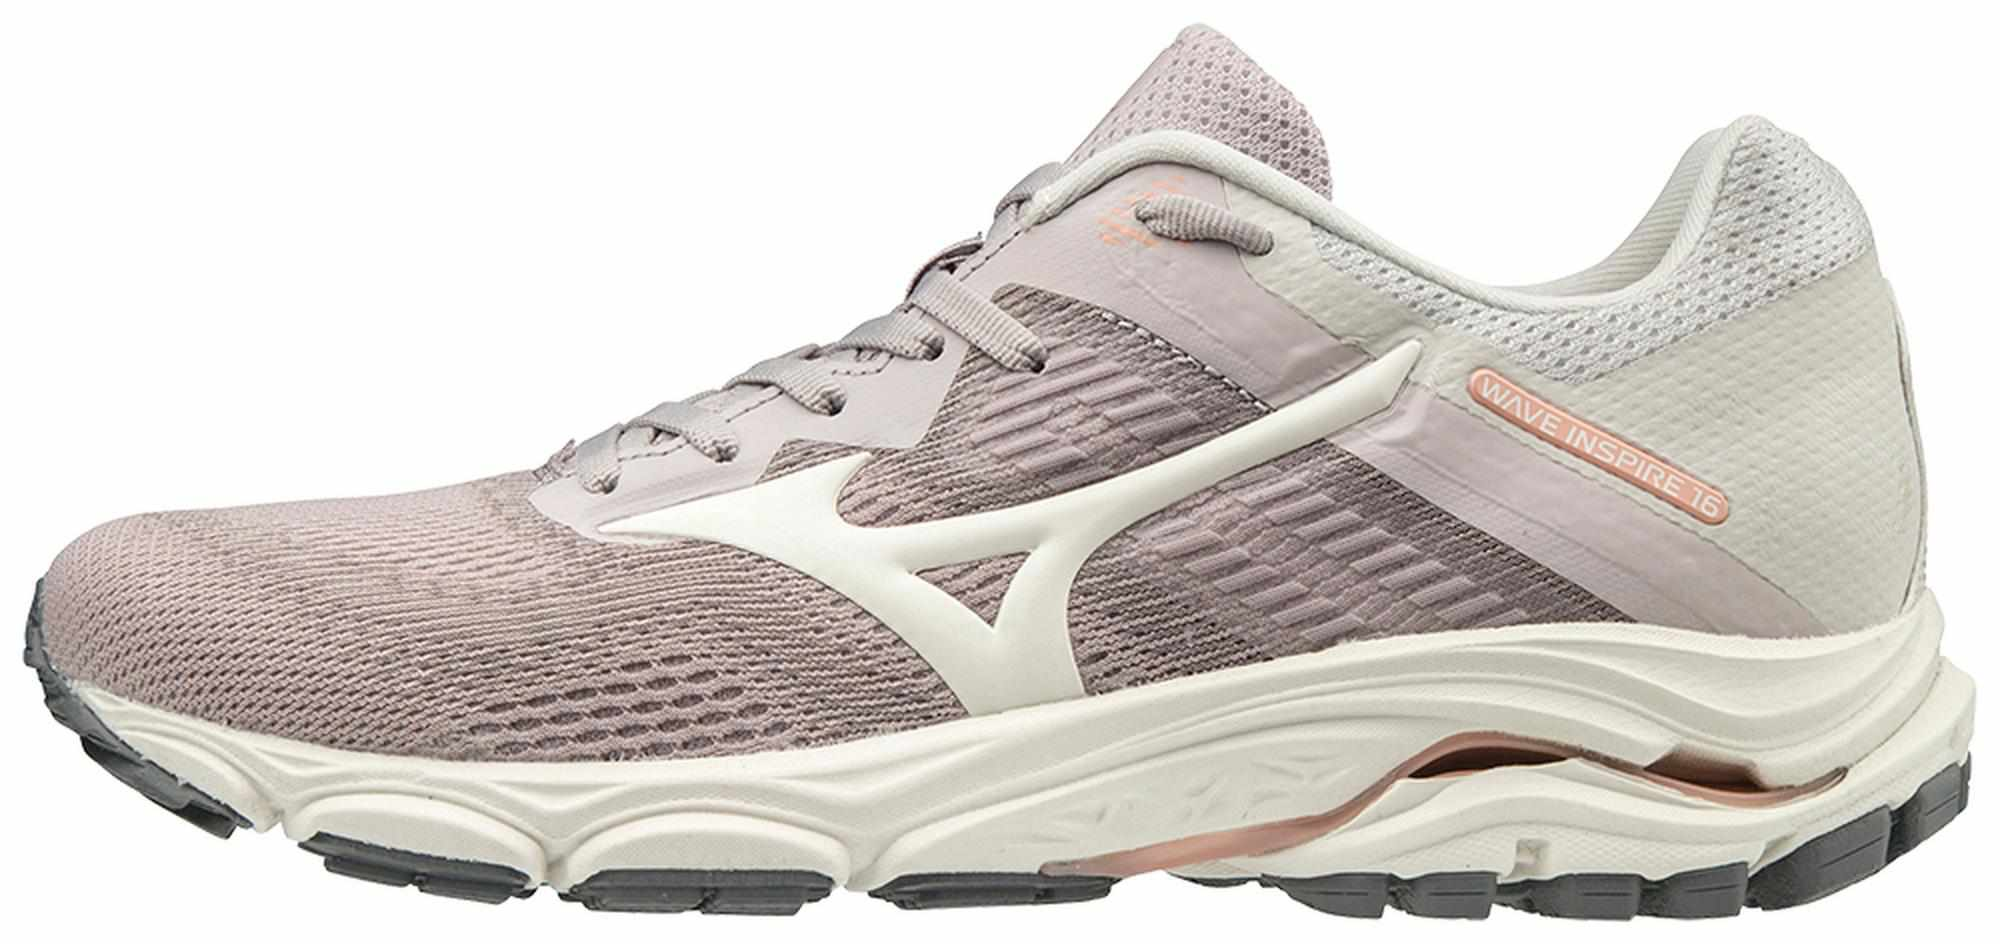 Mizuno Women's Wave Inspire 16 Running Shoes